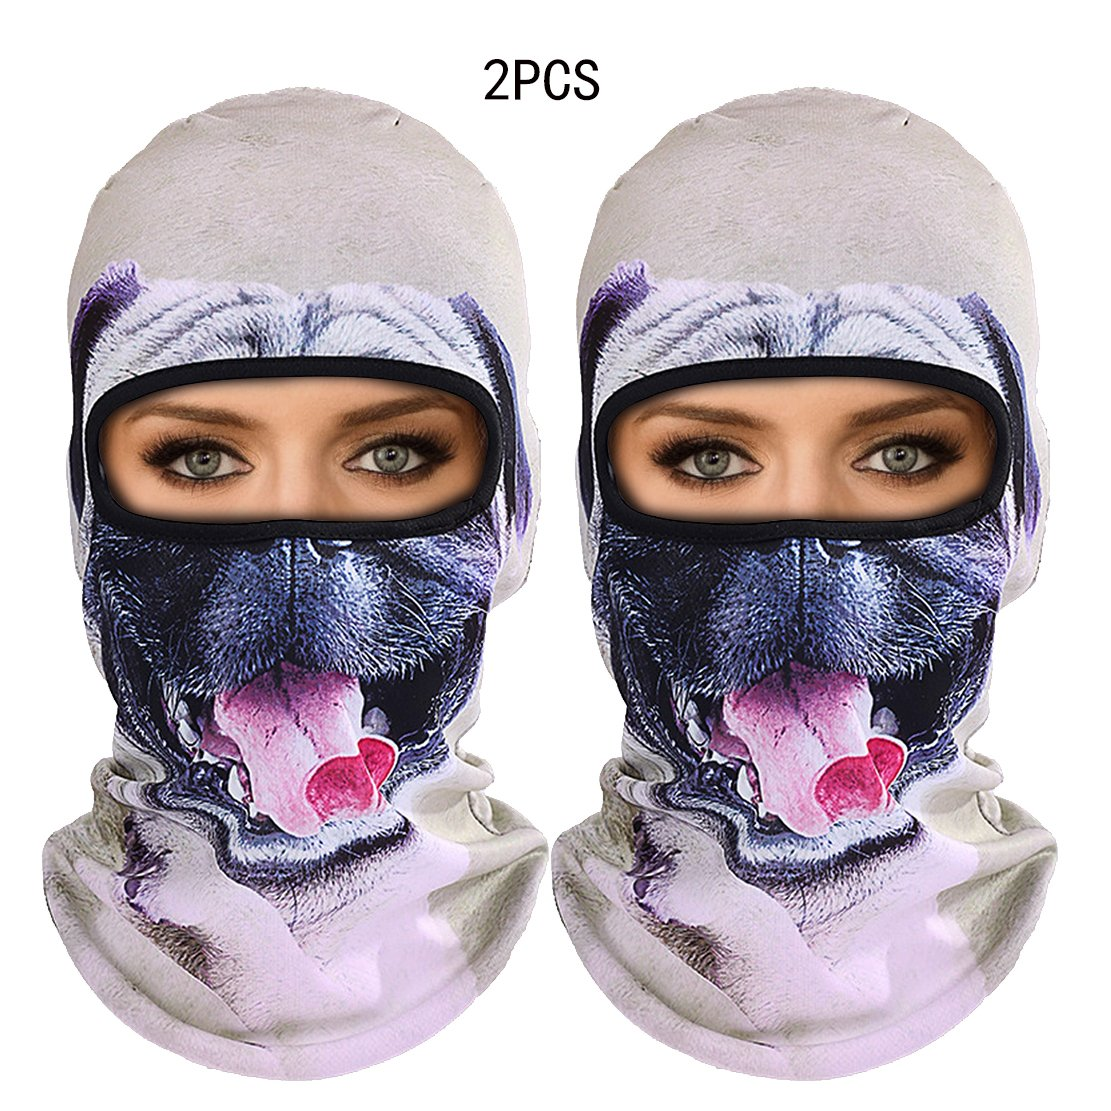 Outgeek Cat Mask, Women Men Balaclava Summer Full Face Hat Animal Ears Sports Helmet Climbing Fishing Cap (Colorful-8 2pcs) by Outgeek (Image #1)